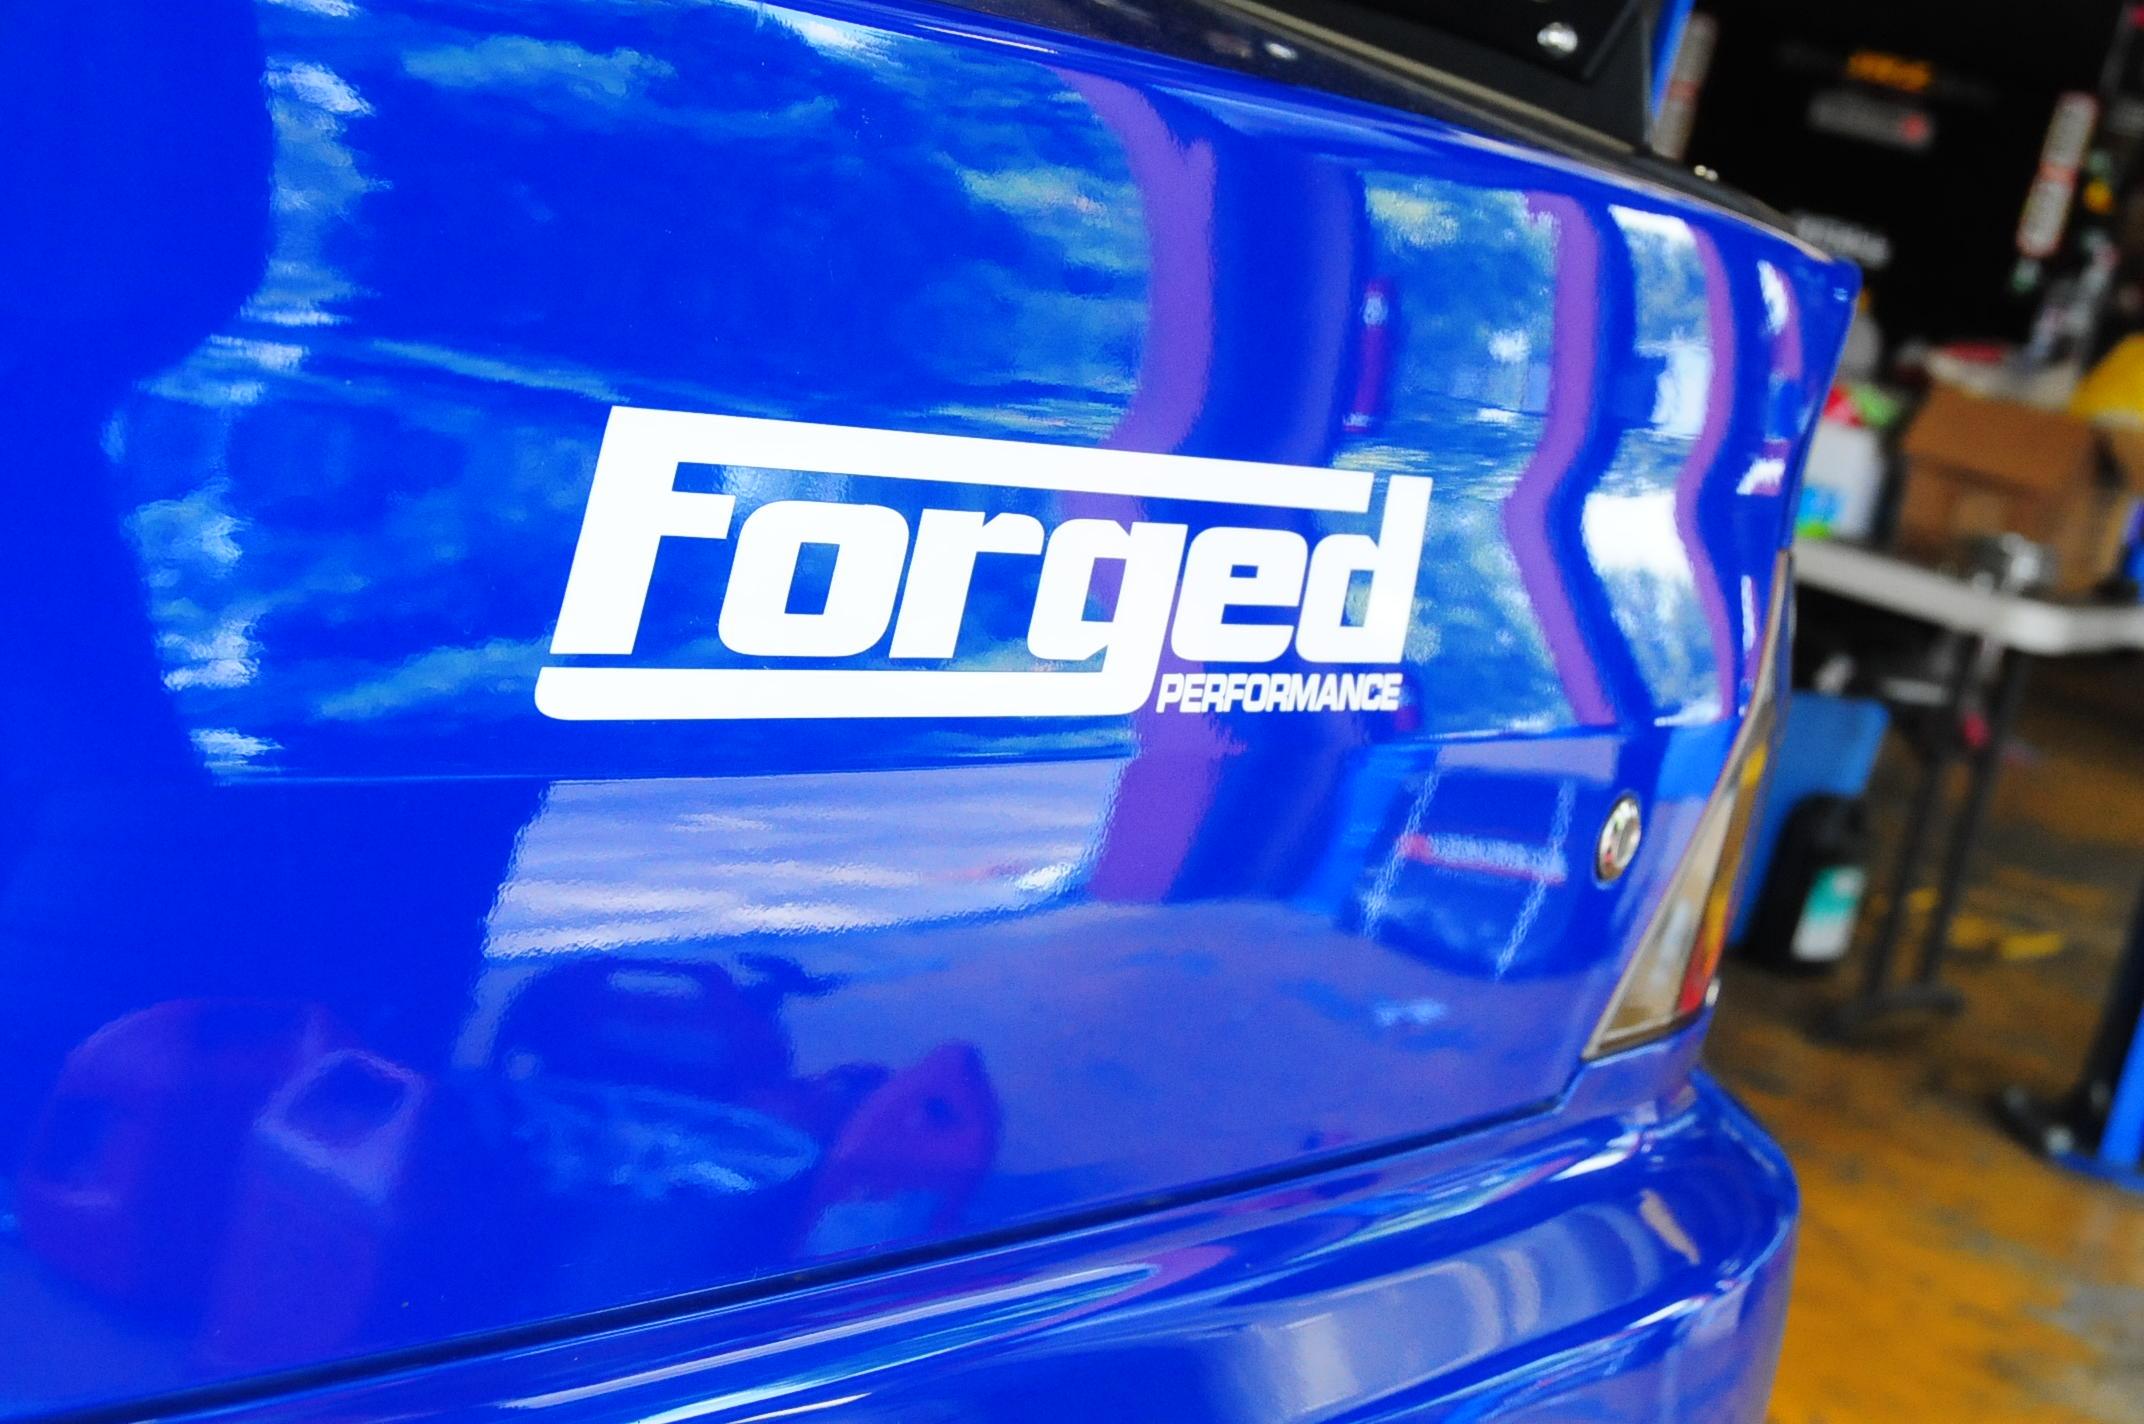 Forged Performance Medium Size Sticker